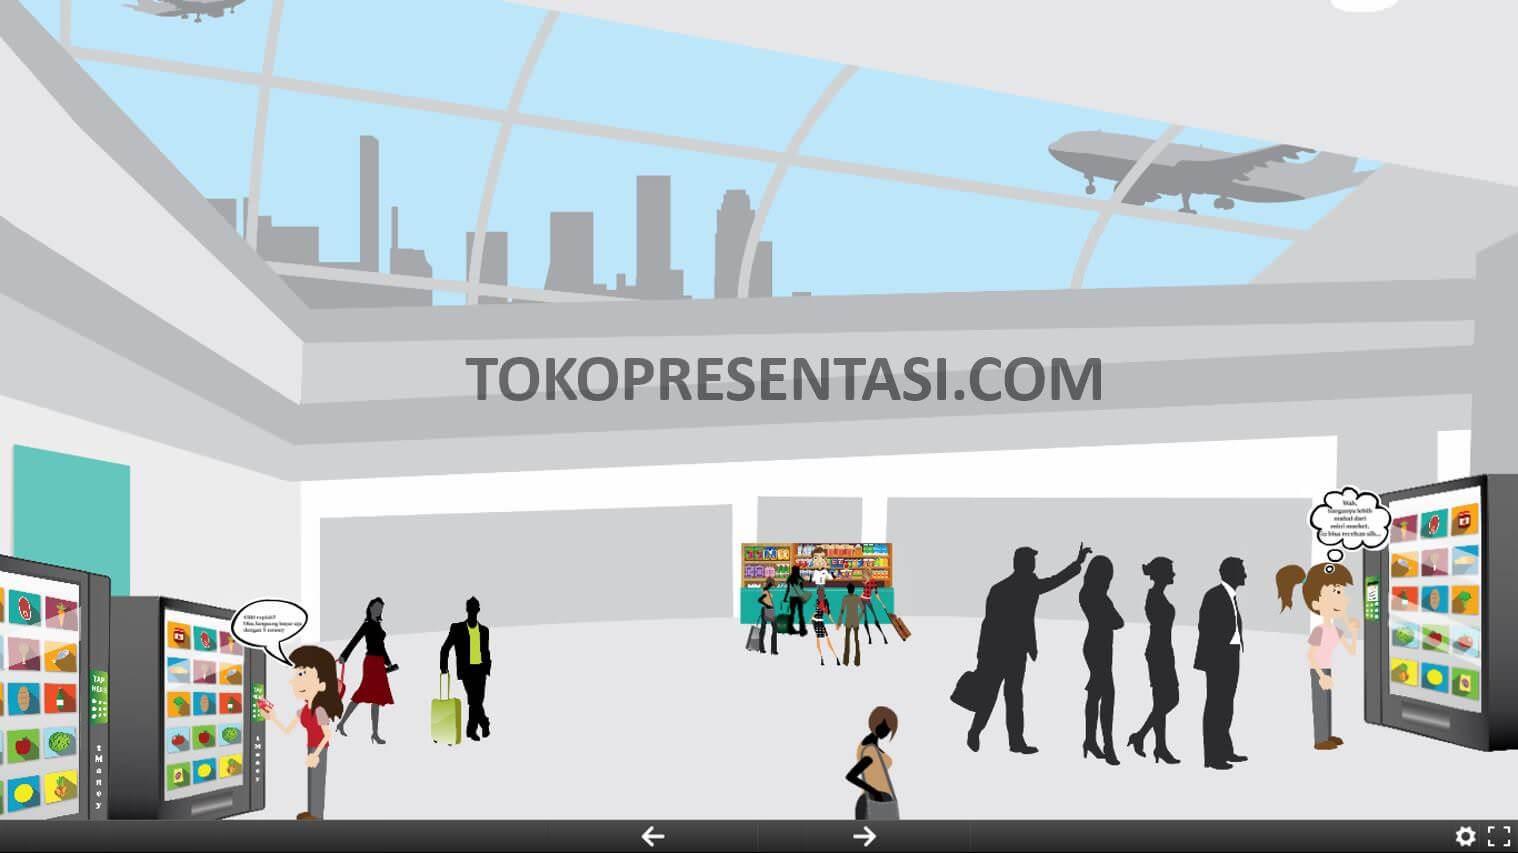 jasa presentasi prezi internal telkom airport portfolio prezi tokopresentasi.com